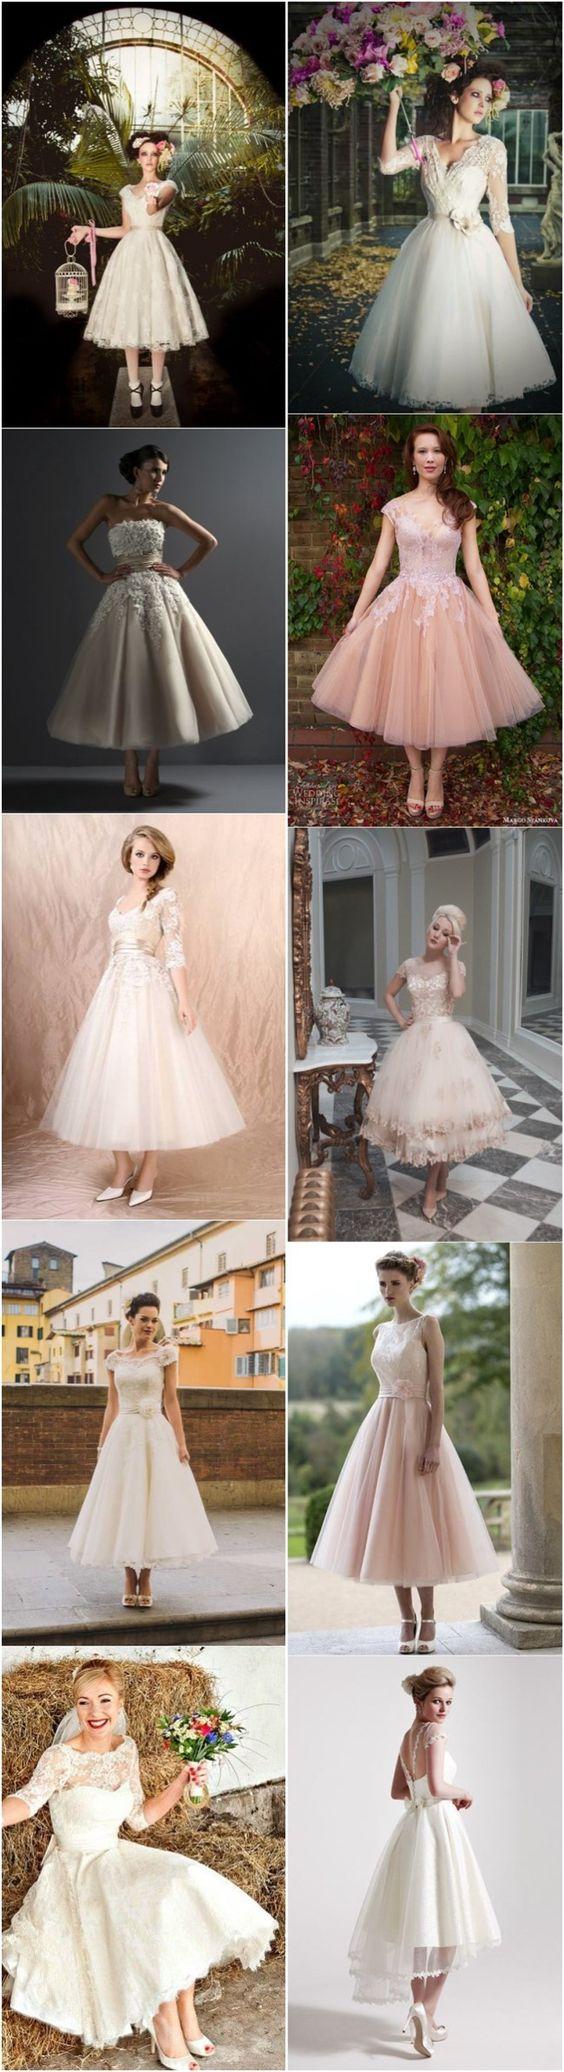 vestidos cortos de novia retro